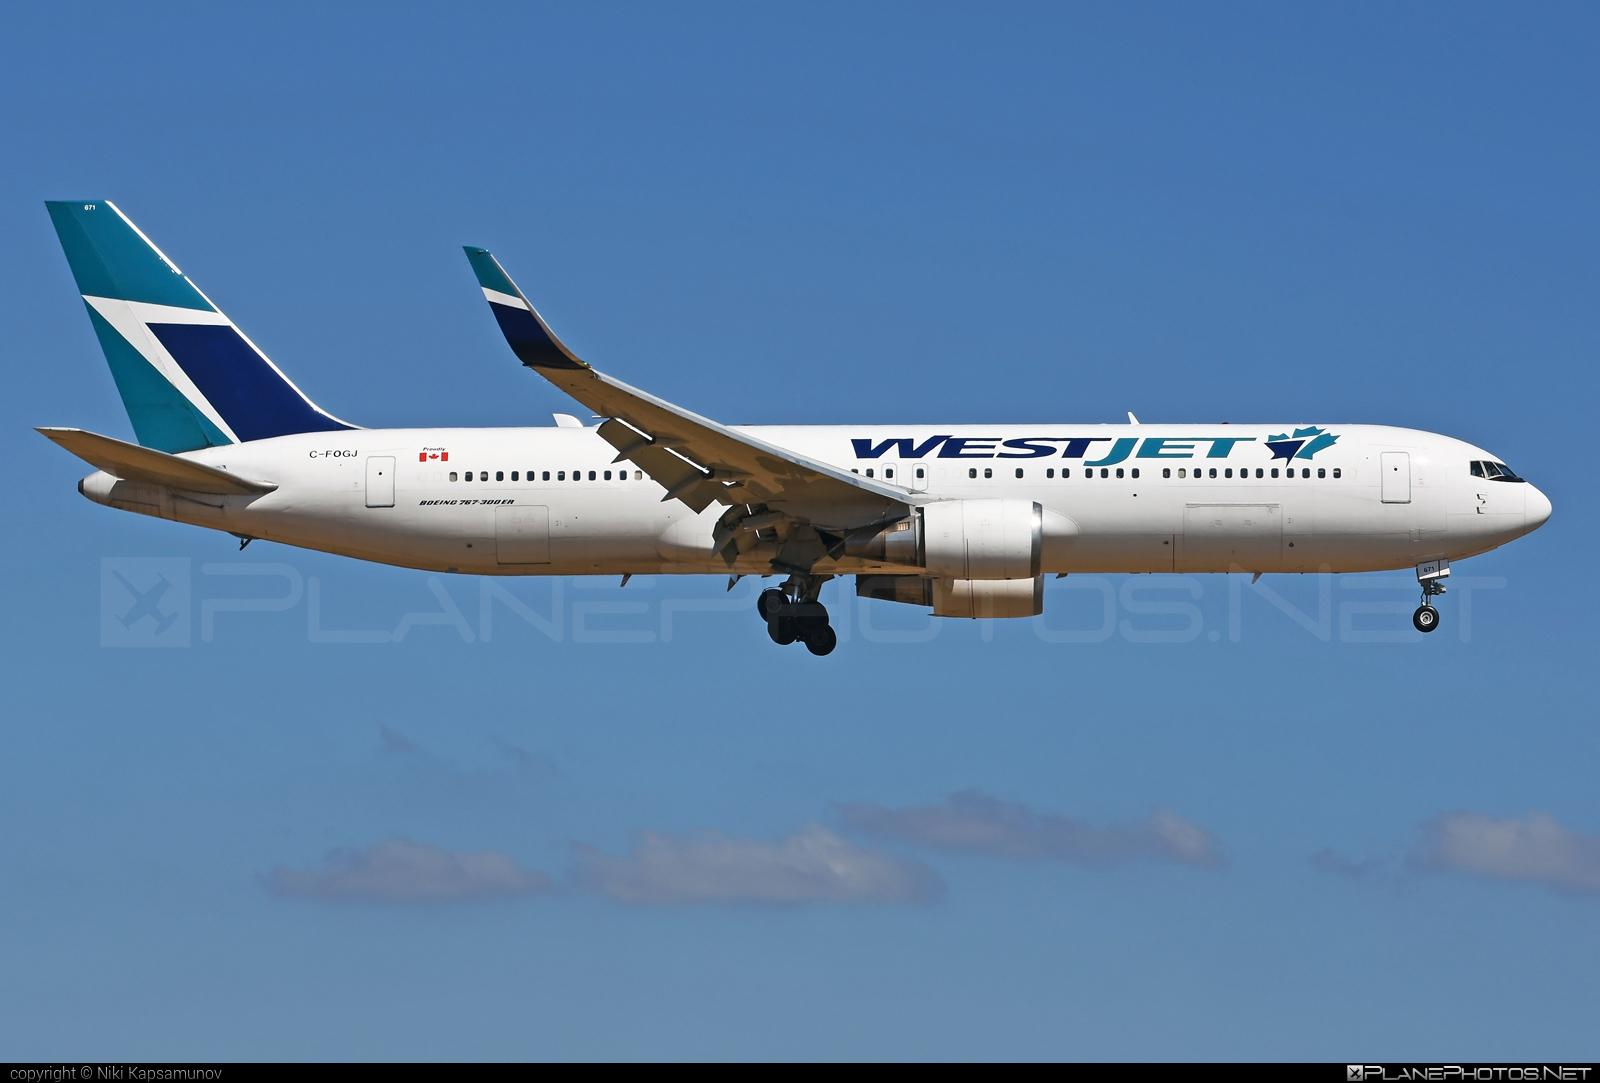 Boeing 767-300ER - C-FOGJ operated by WestJet Airlines #b767 #b767er #boeing #boeing767